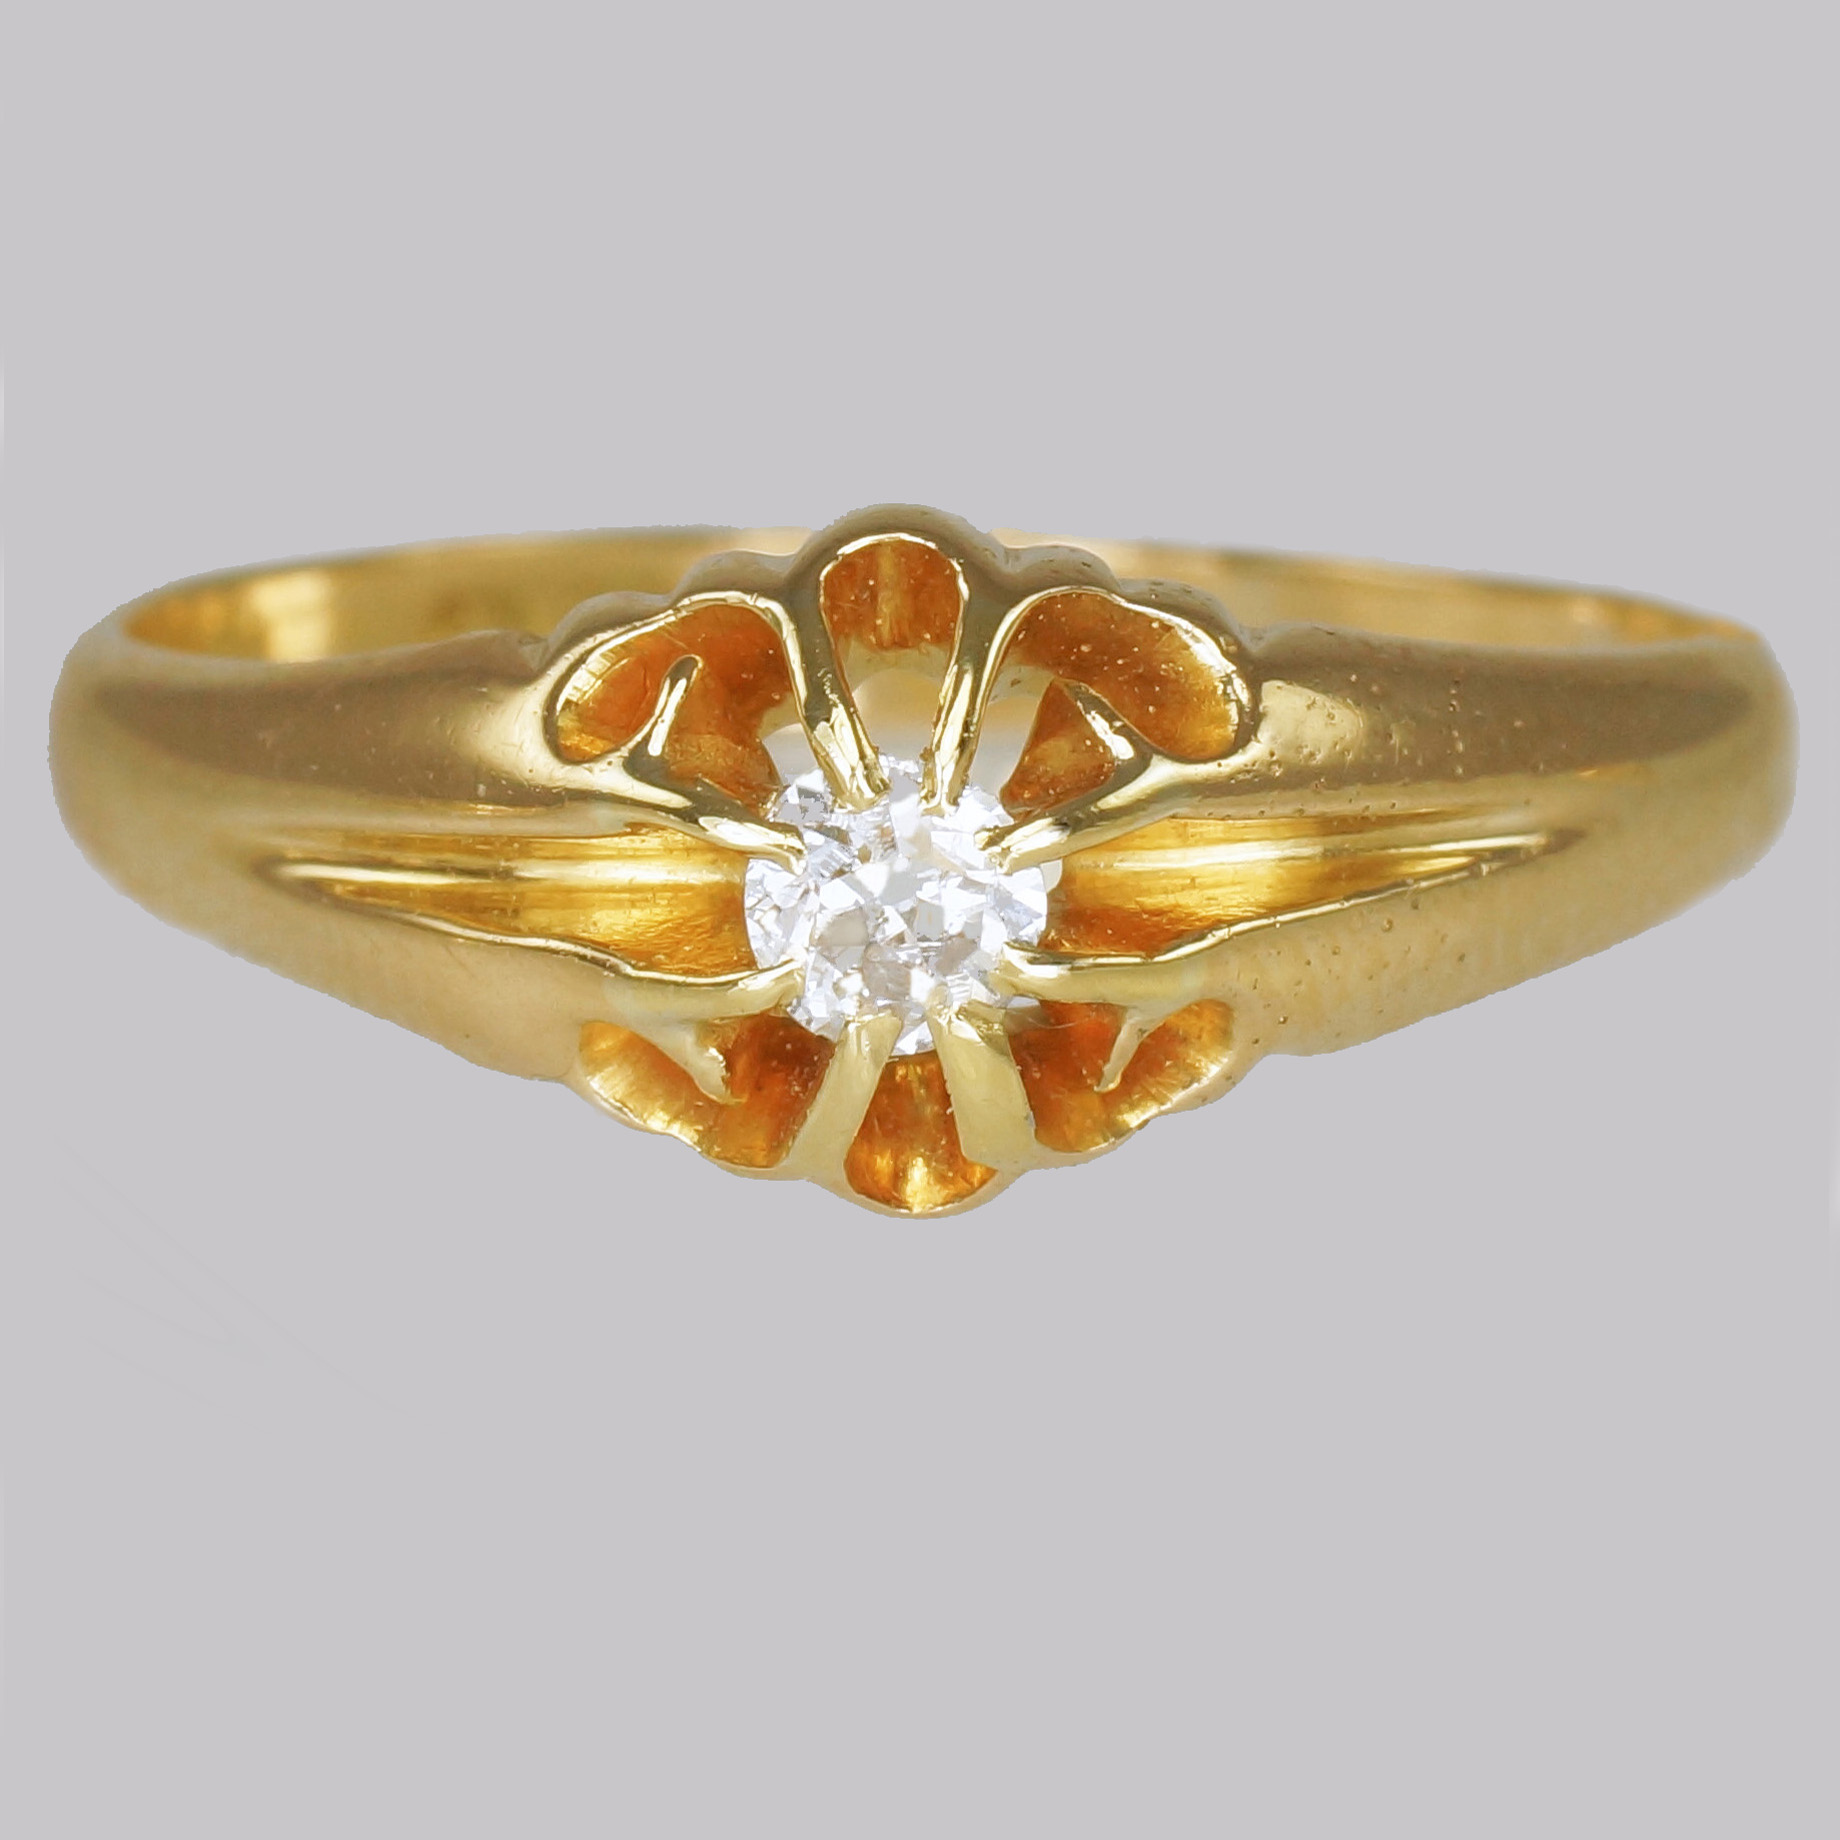 Antique 18ct Gold Diamond Solitaire Ring